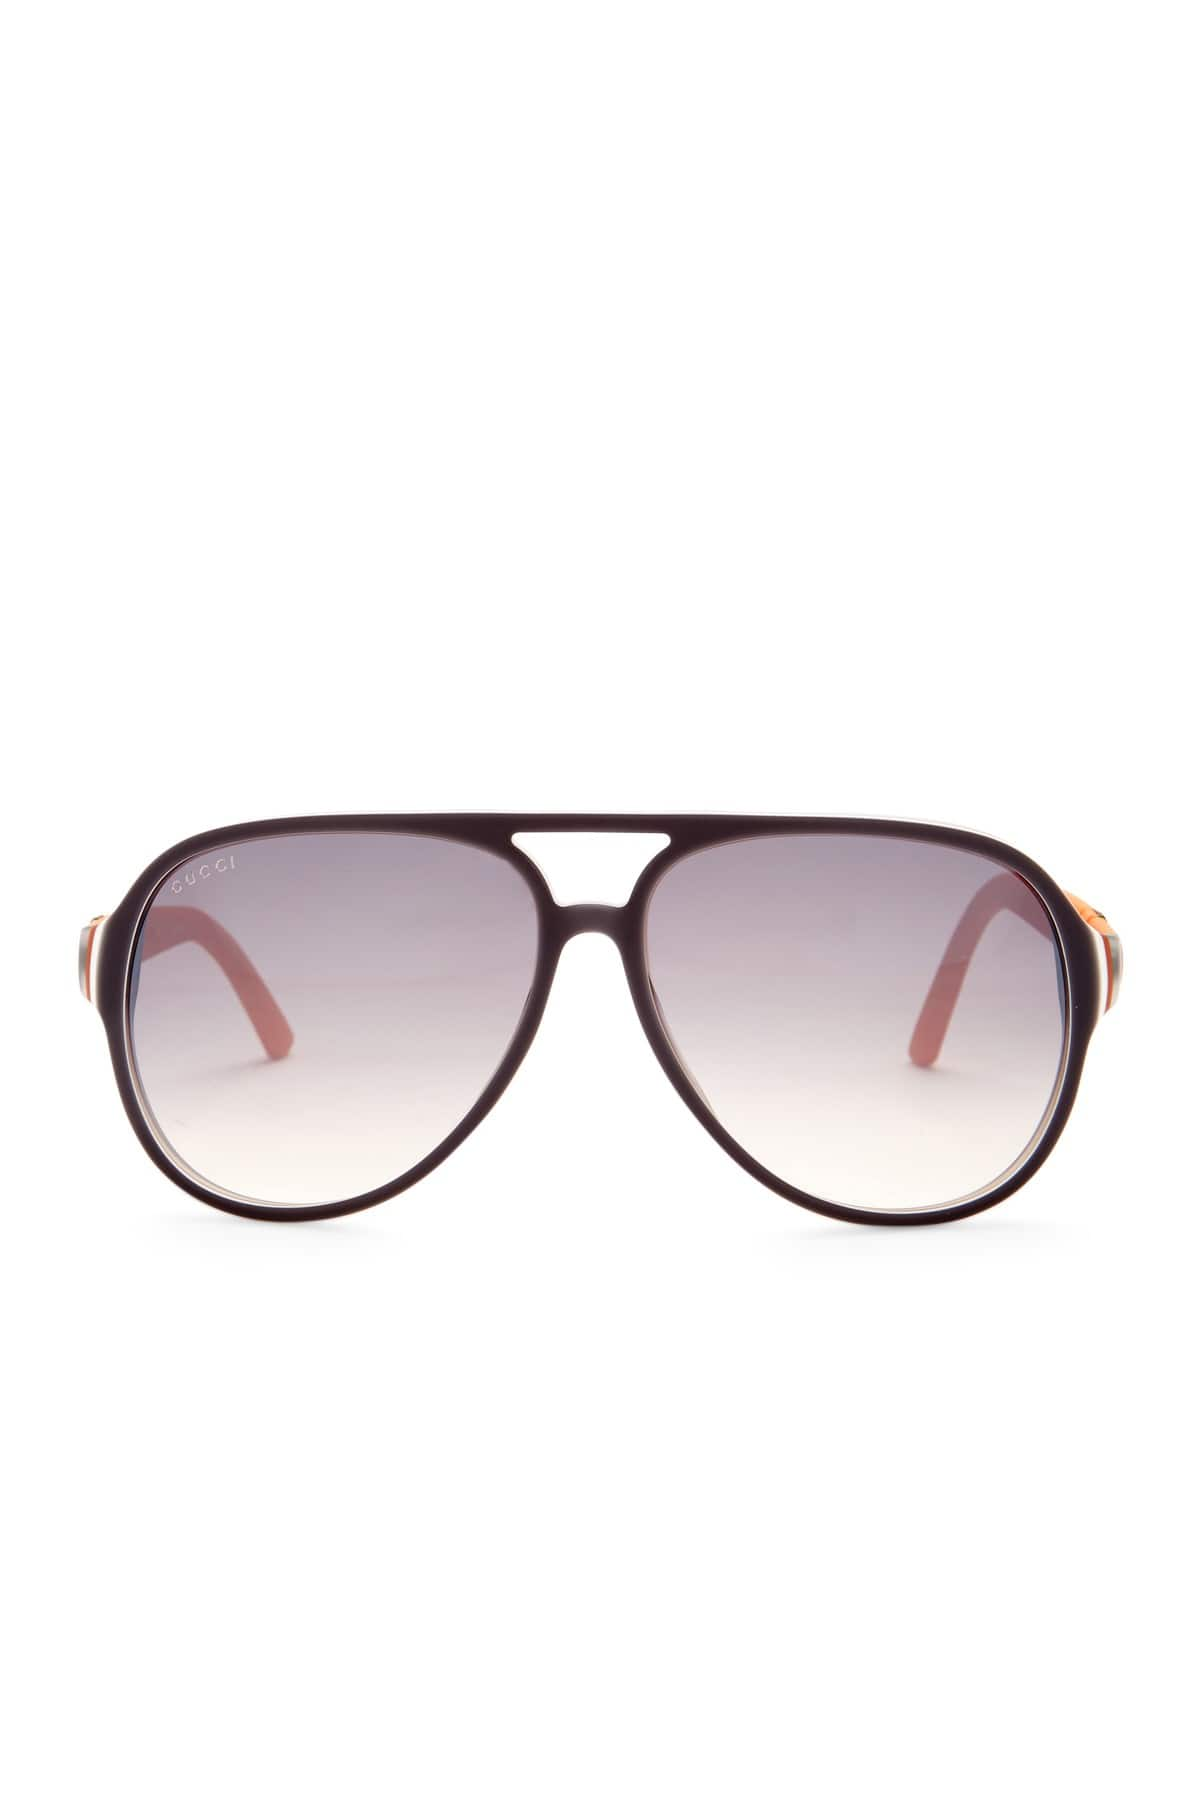 GUCCI Men's Aviator Plastic Frame Sunglasses $119.97+ fs@Nordstrom Rack